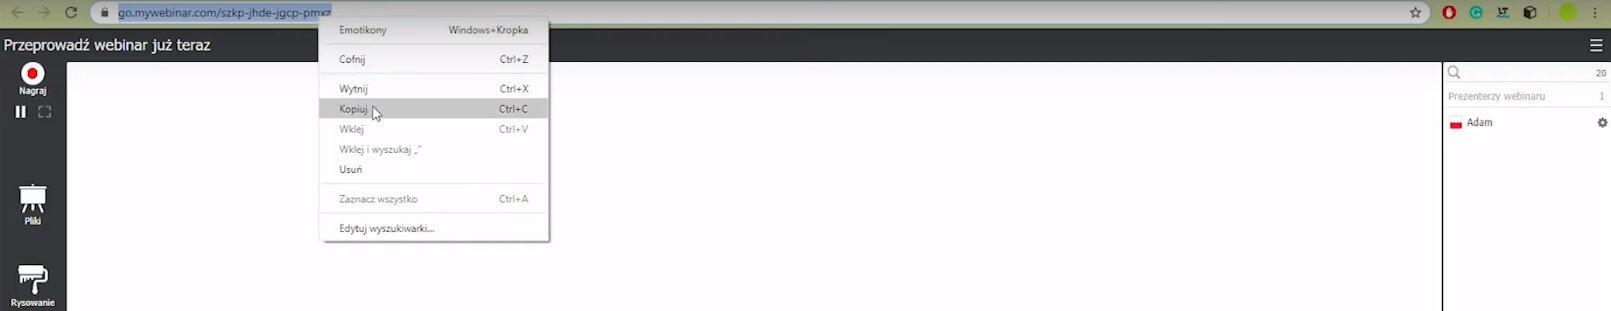 Webinar ad hoc link